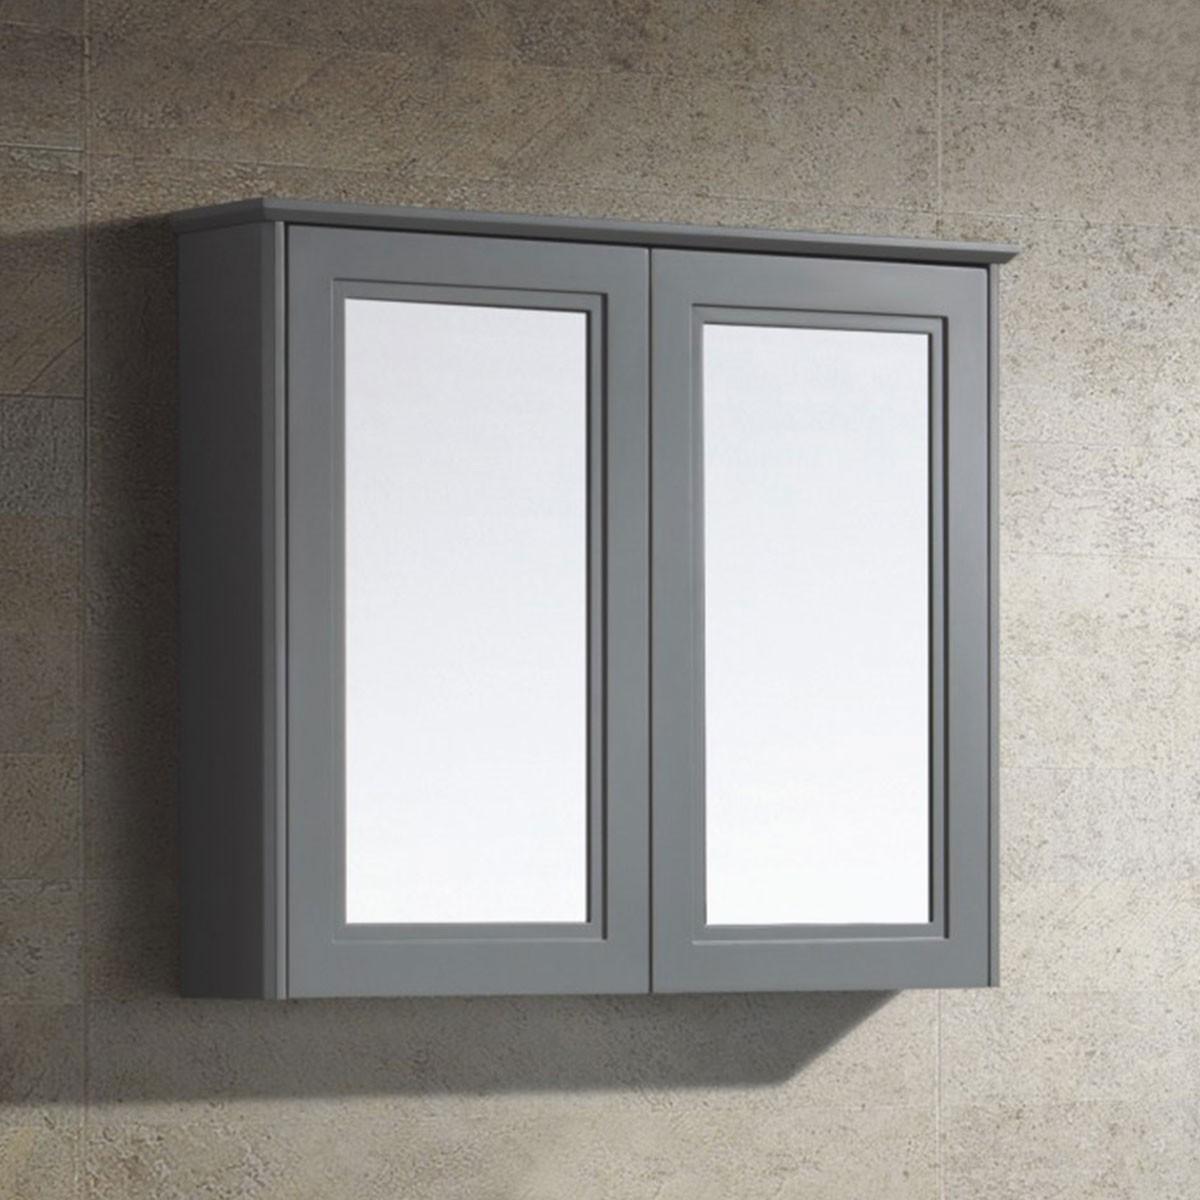 31 x 26 po Armoire-Miroir (BR8002-M)